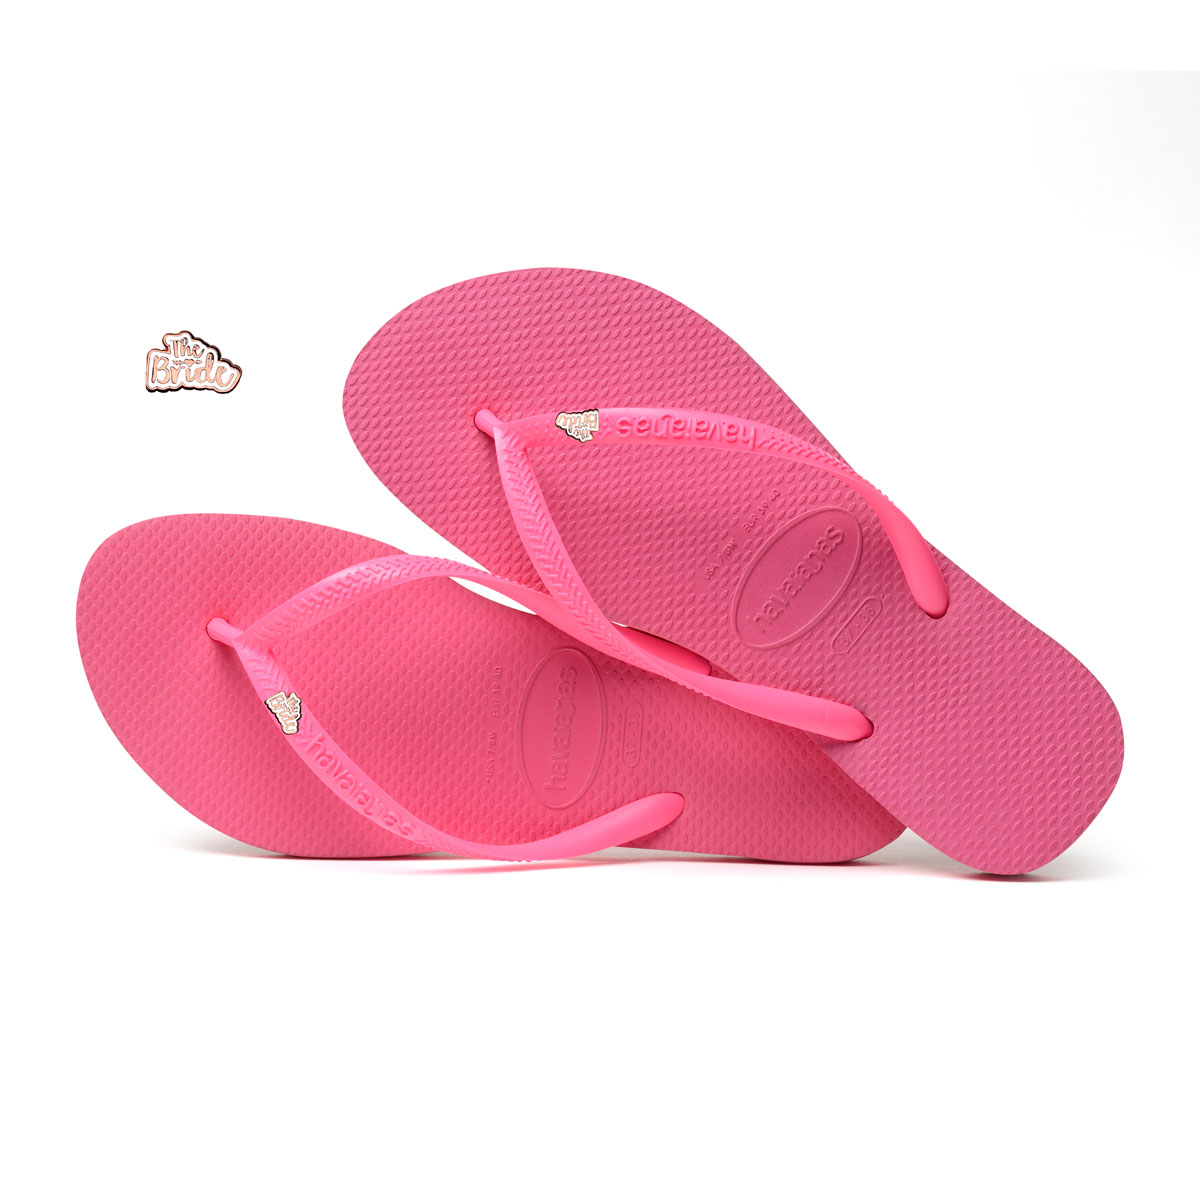 Rose Gold 'The Bride' Havaianas Slim Shocking Pink Wedding Flip Flops